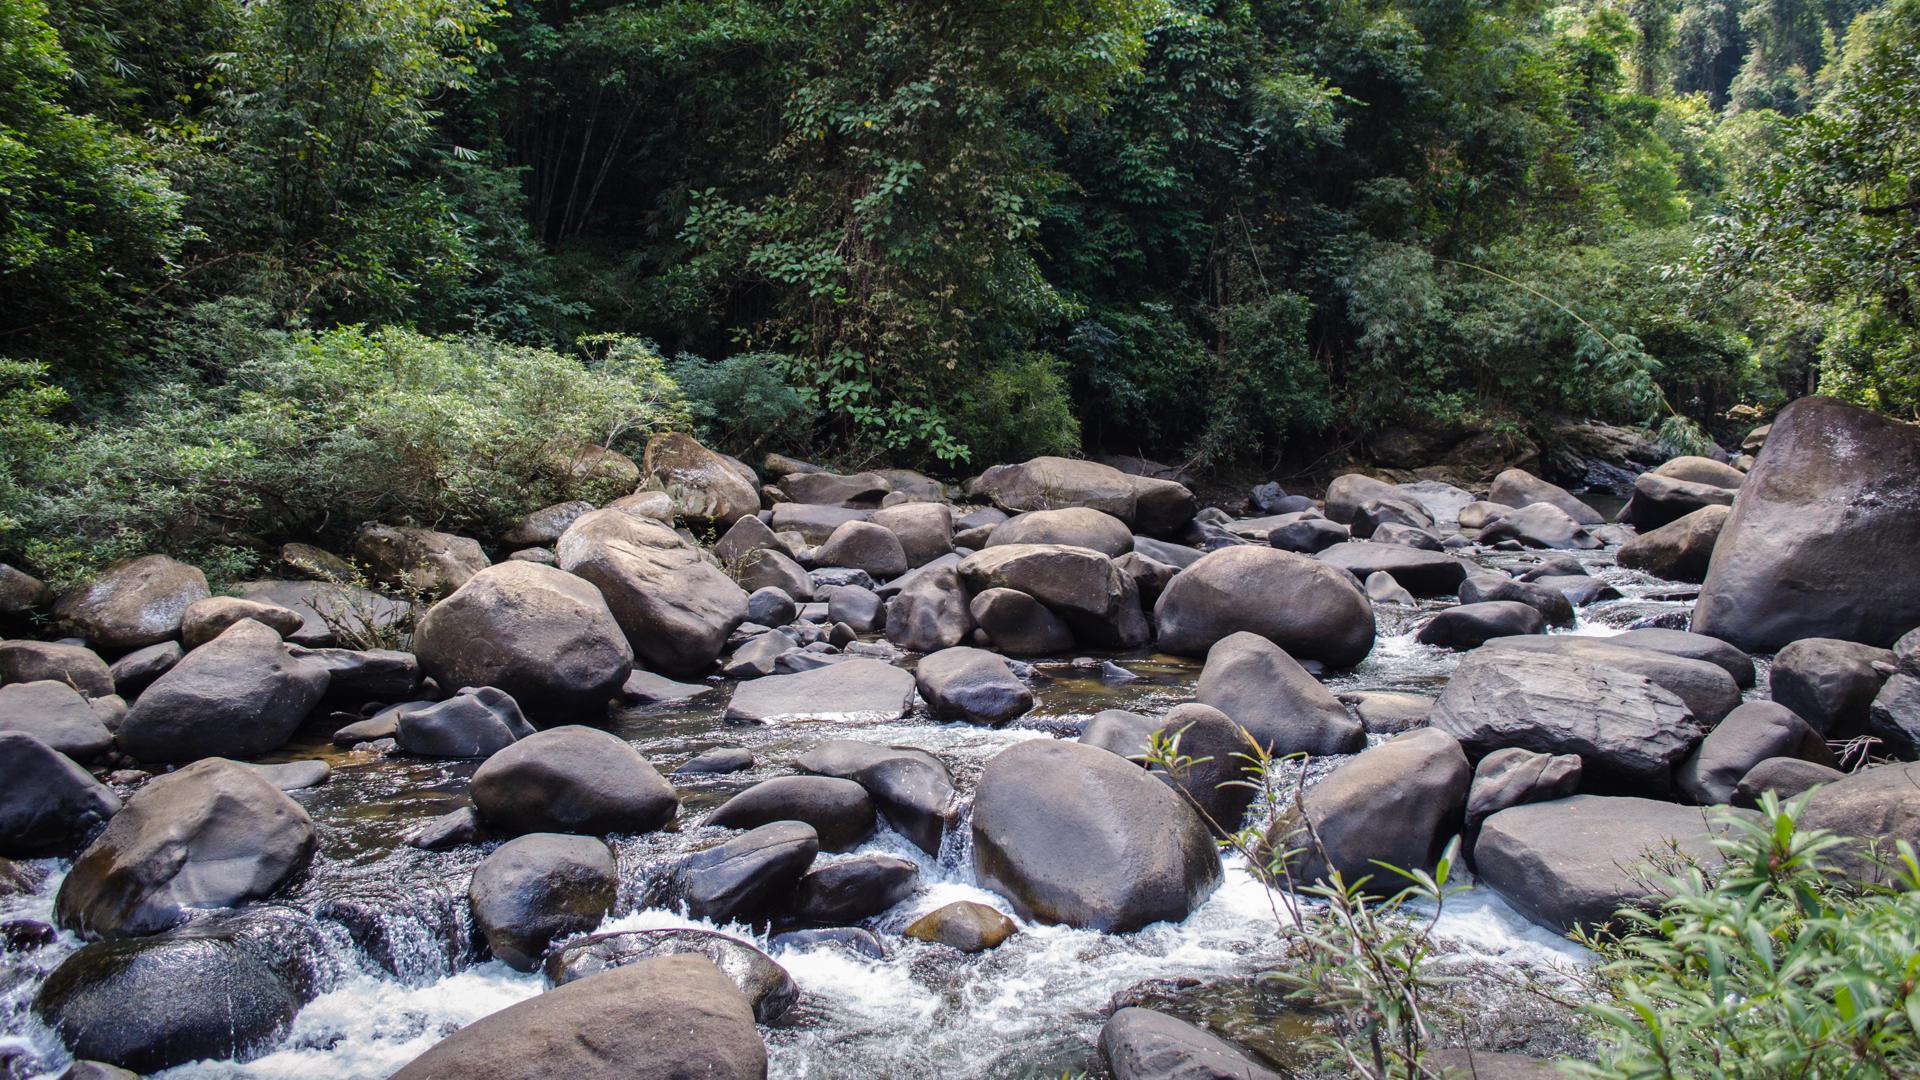 khao sok without guide, khao sok national park